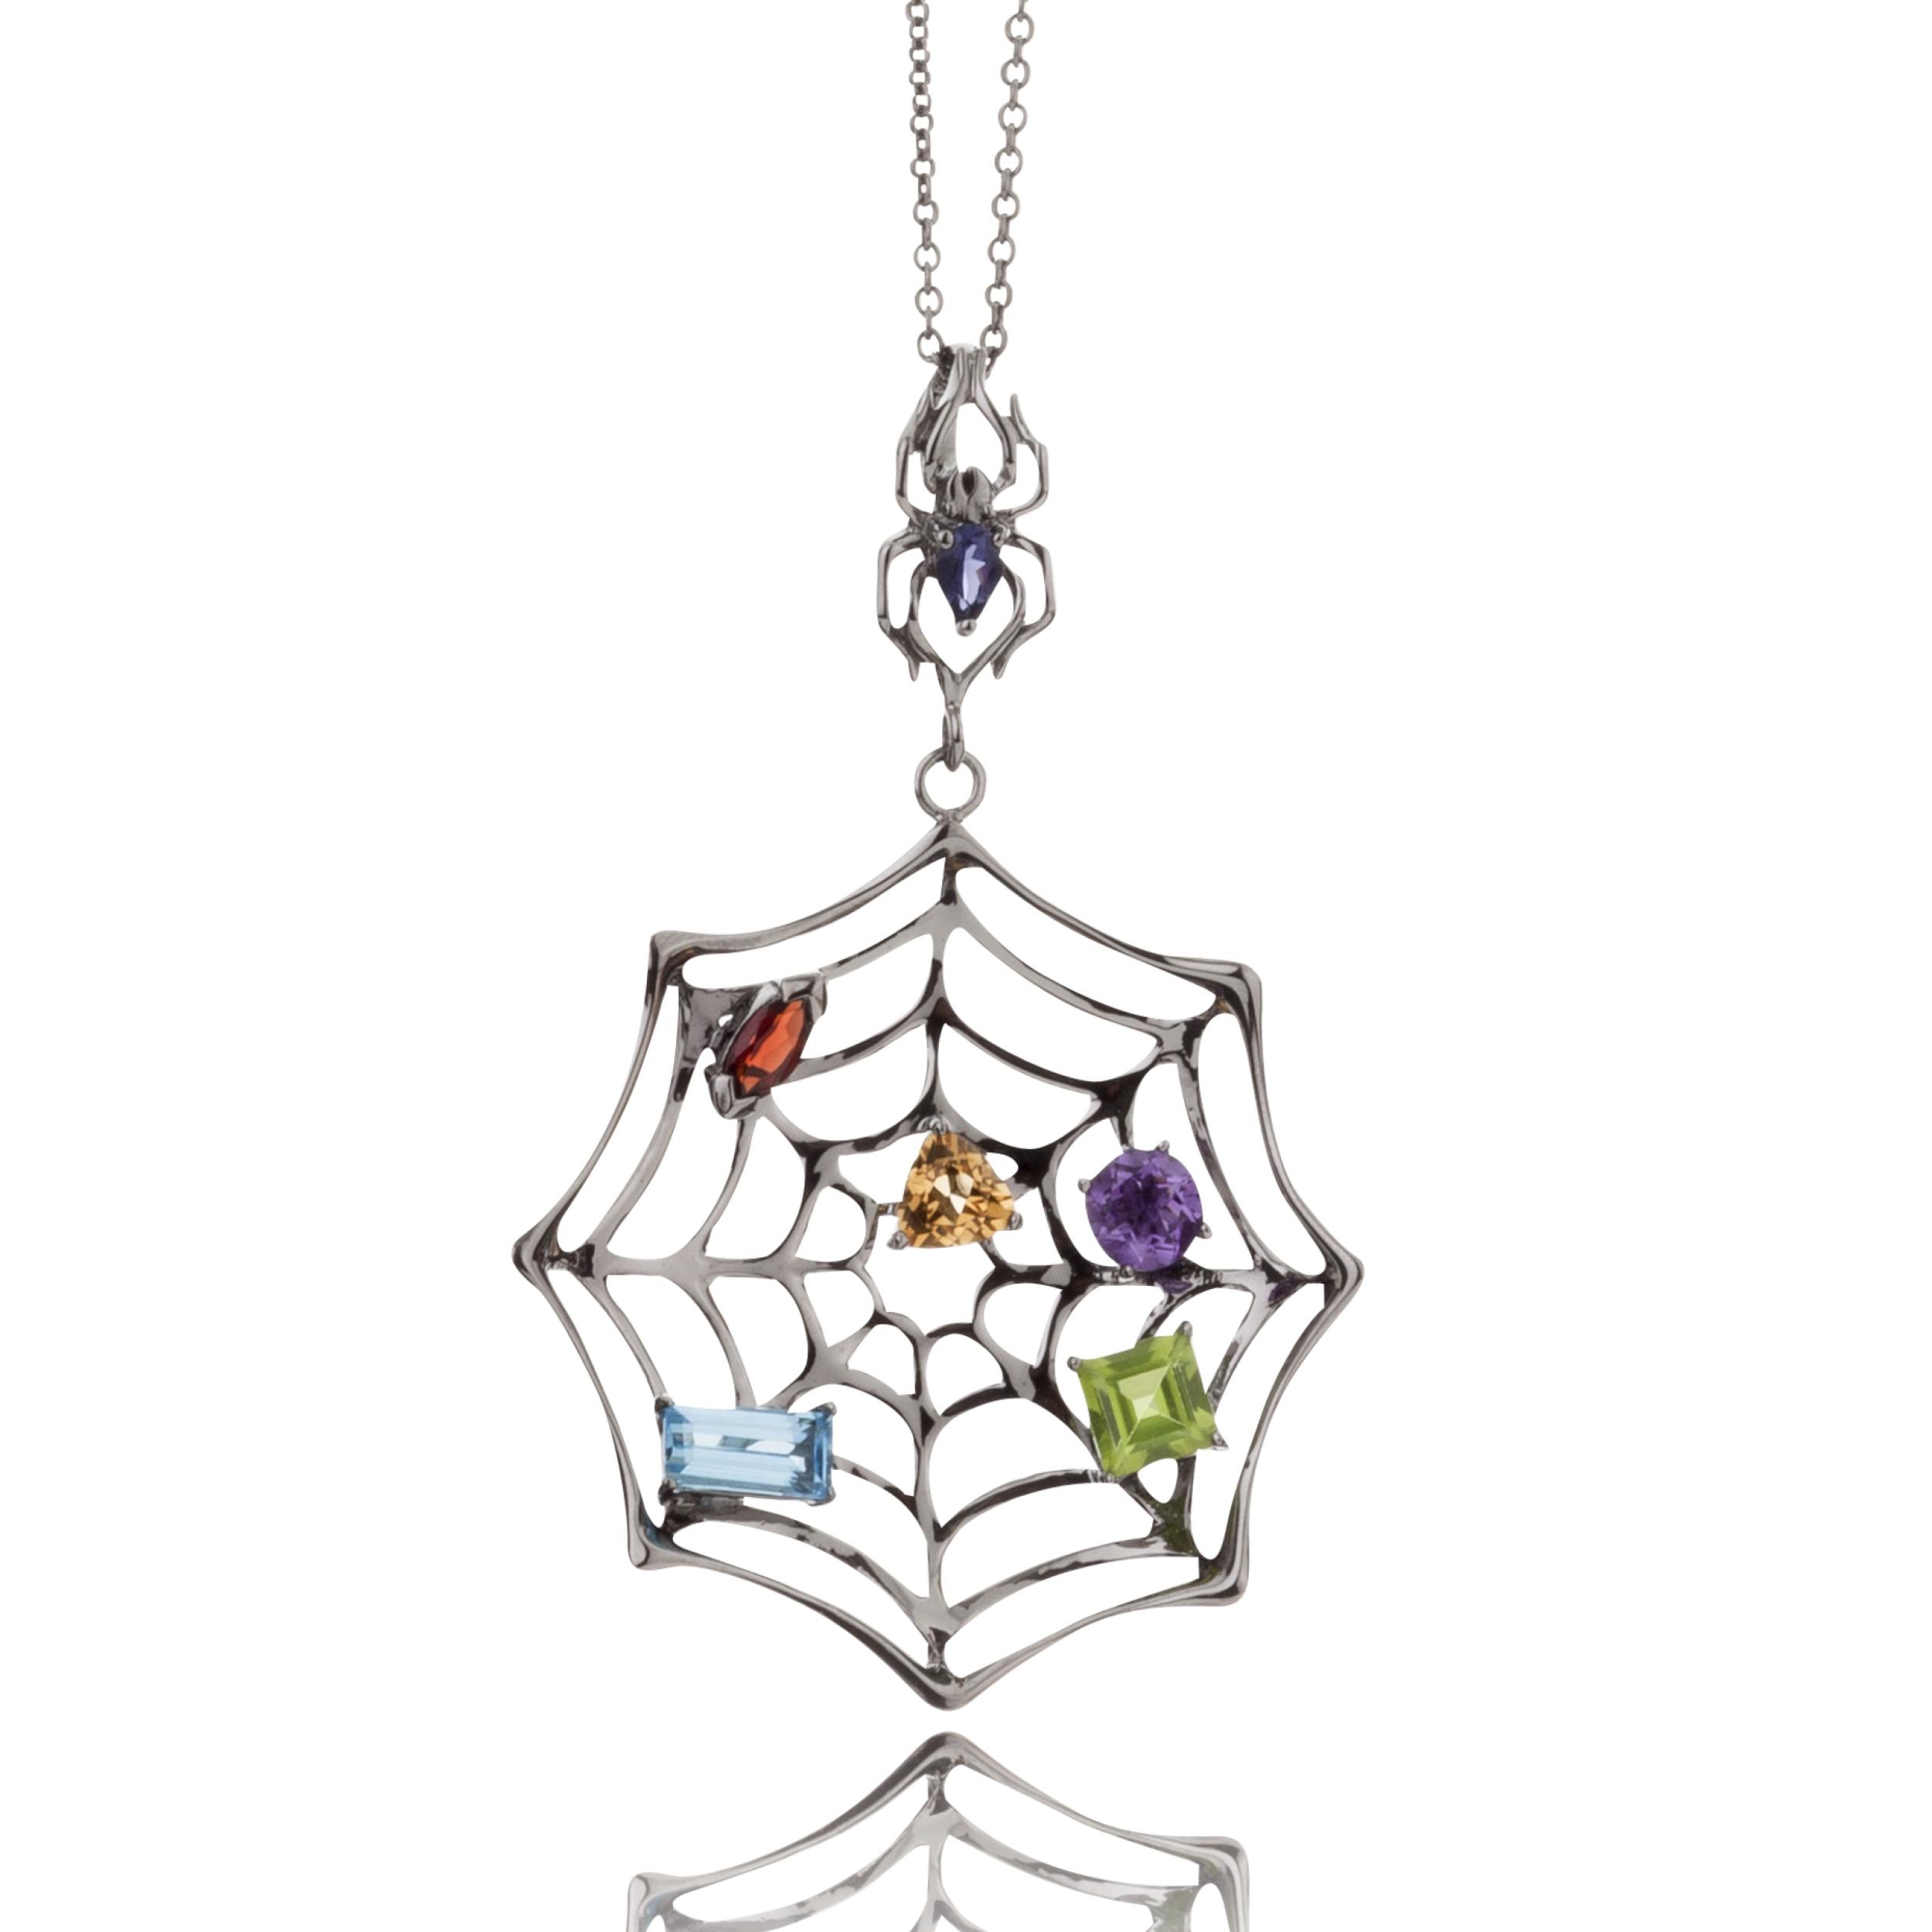 Jewellery by Manja - from Originals Jewellers & Gallery